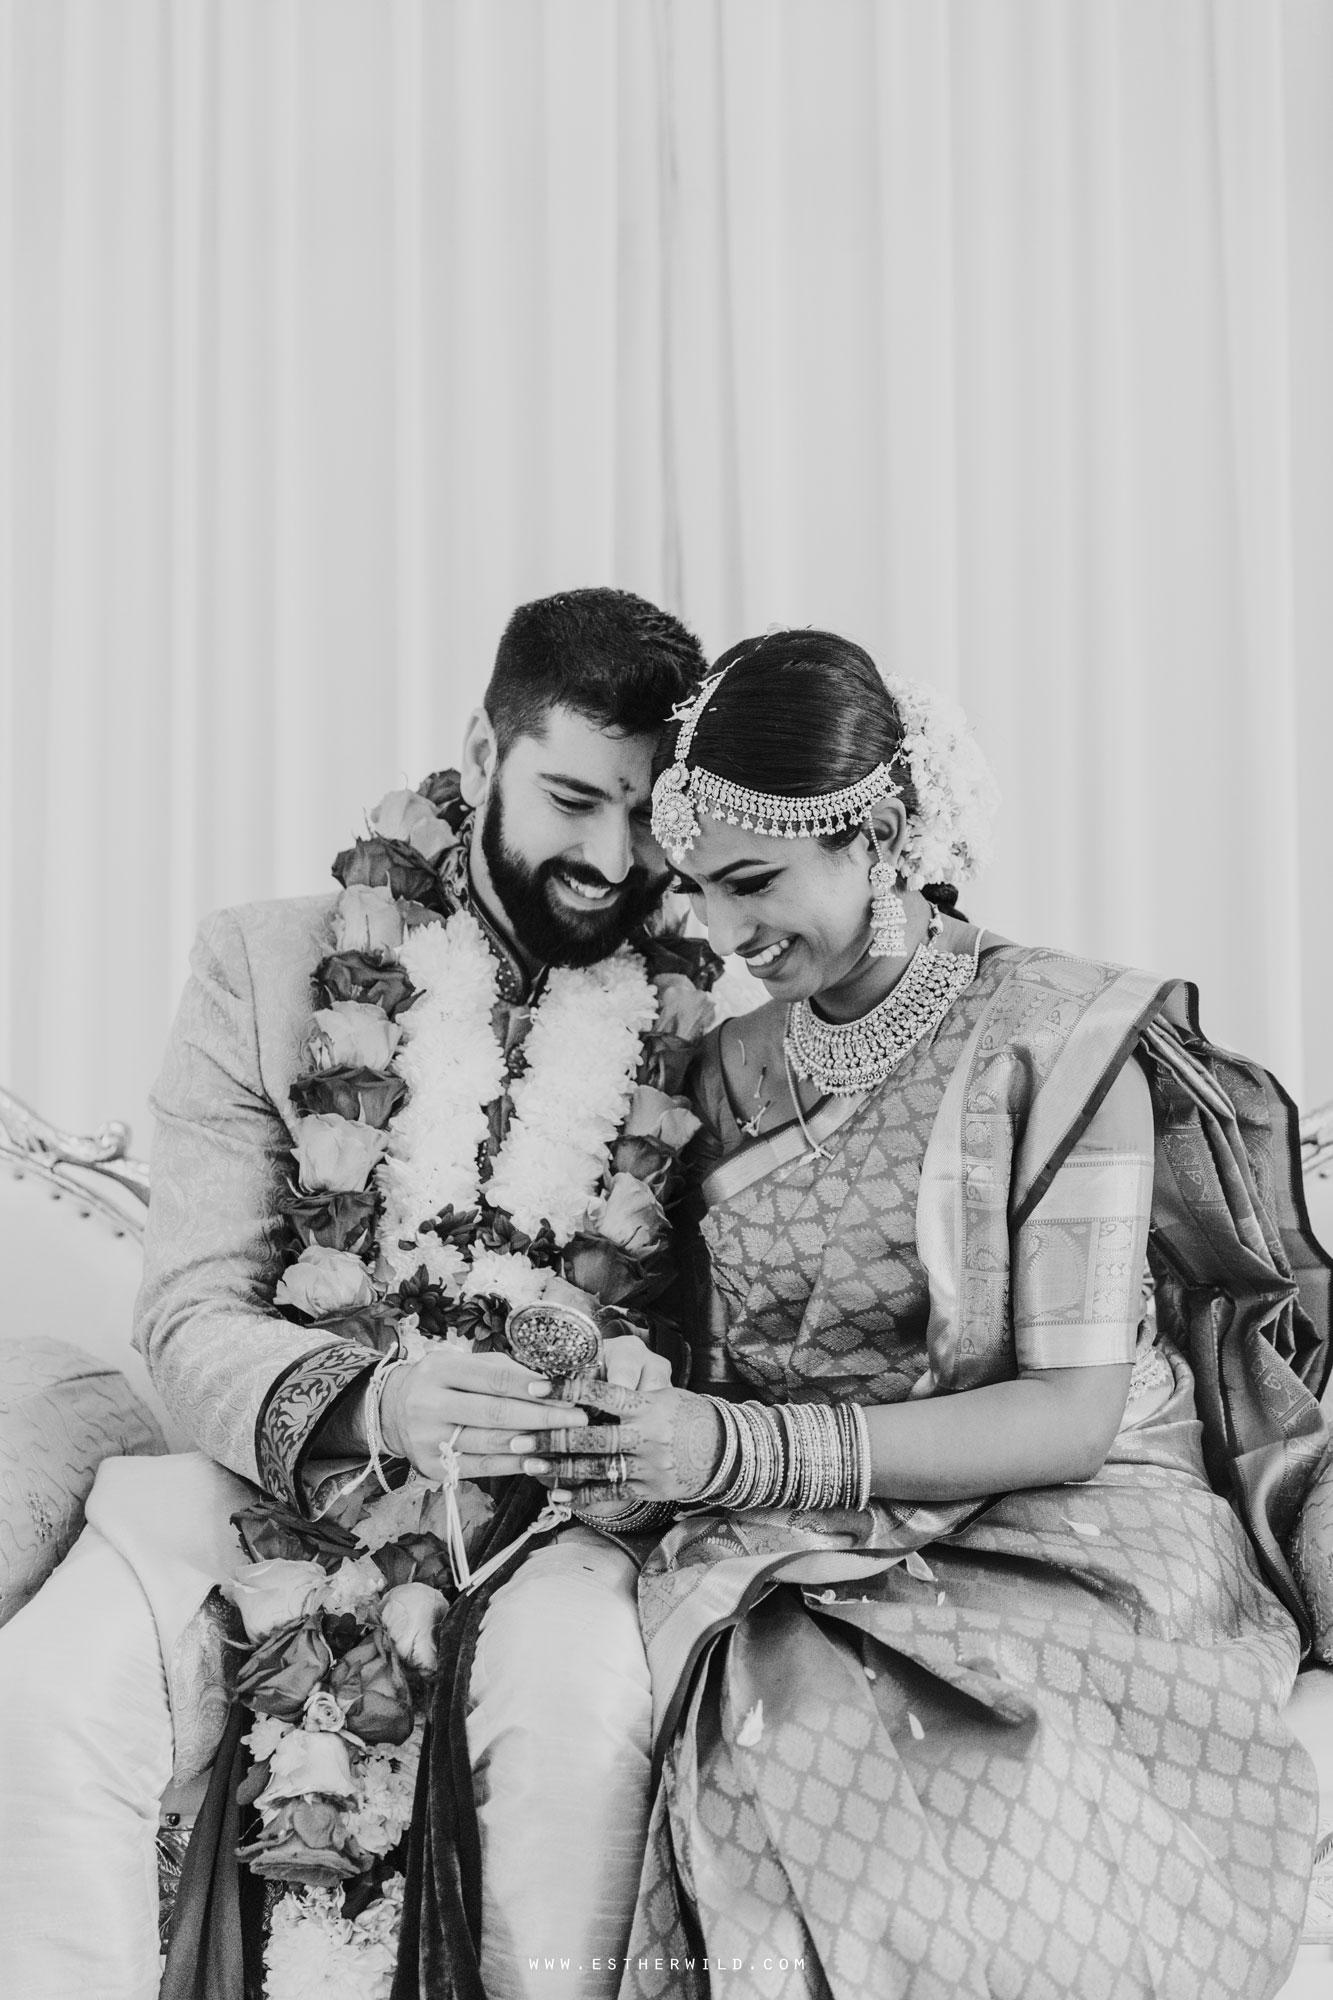 Northbrook_Park_Farnham_Surrey_London_Wedding_Hindu_Fusion_Esther_Wild_Photographer_IMG_4585-2.jpg